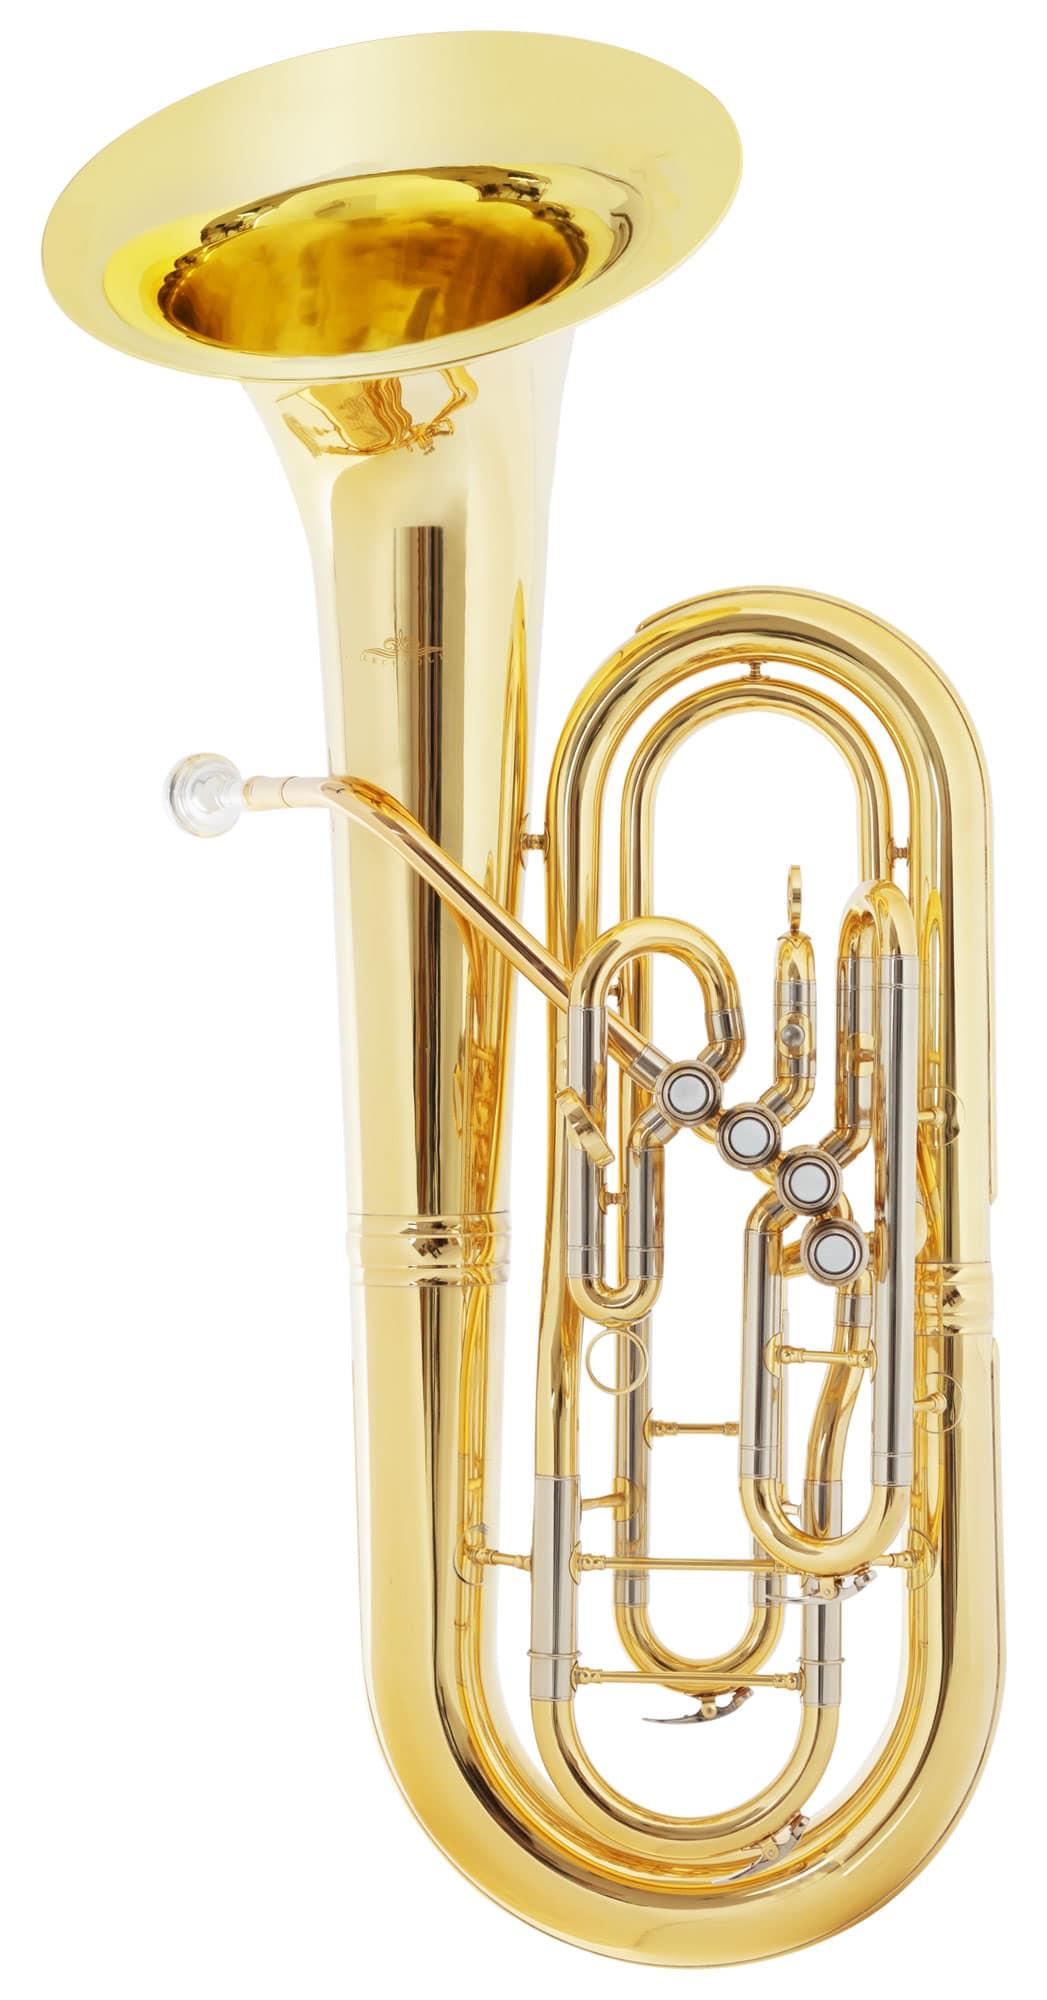 Baritone - Lechgold OB 19|4 Oberkrainer Bariton - Onlineshop Musikhaus Kirstein